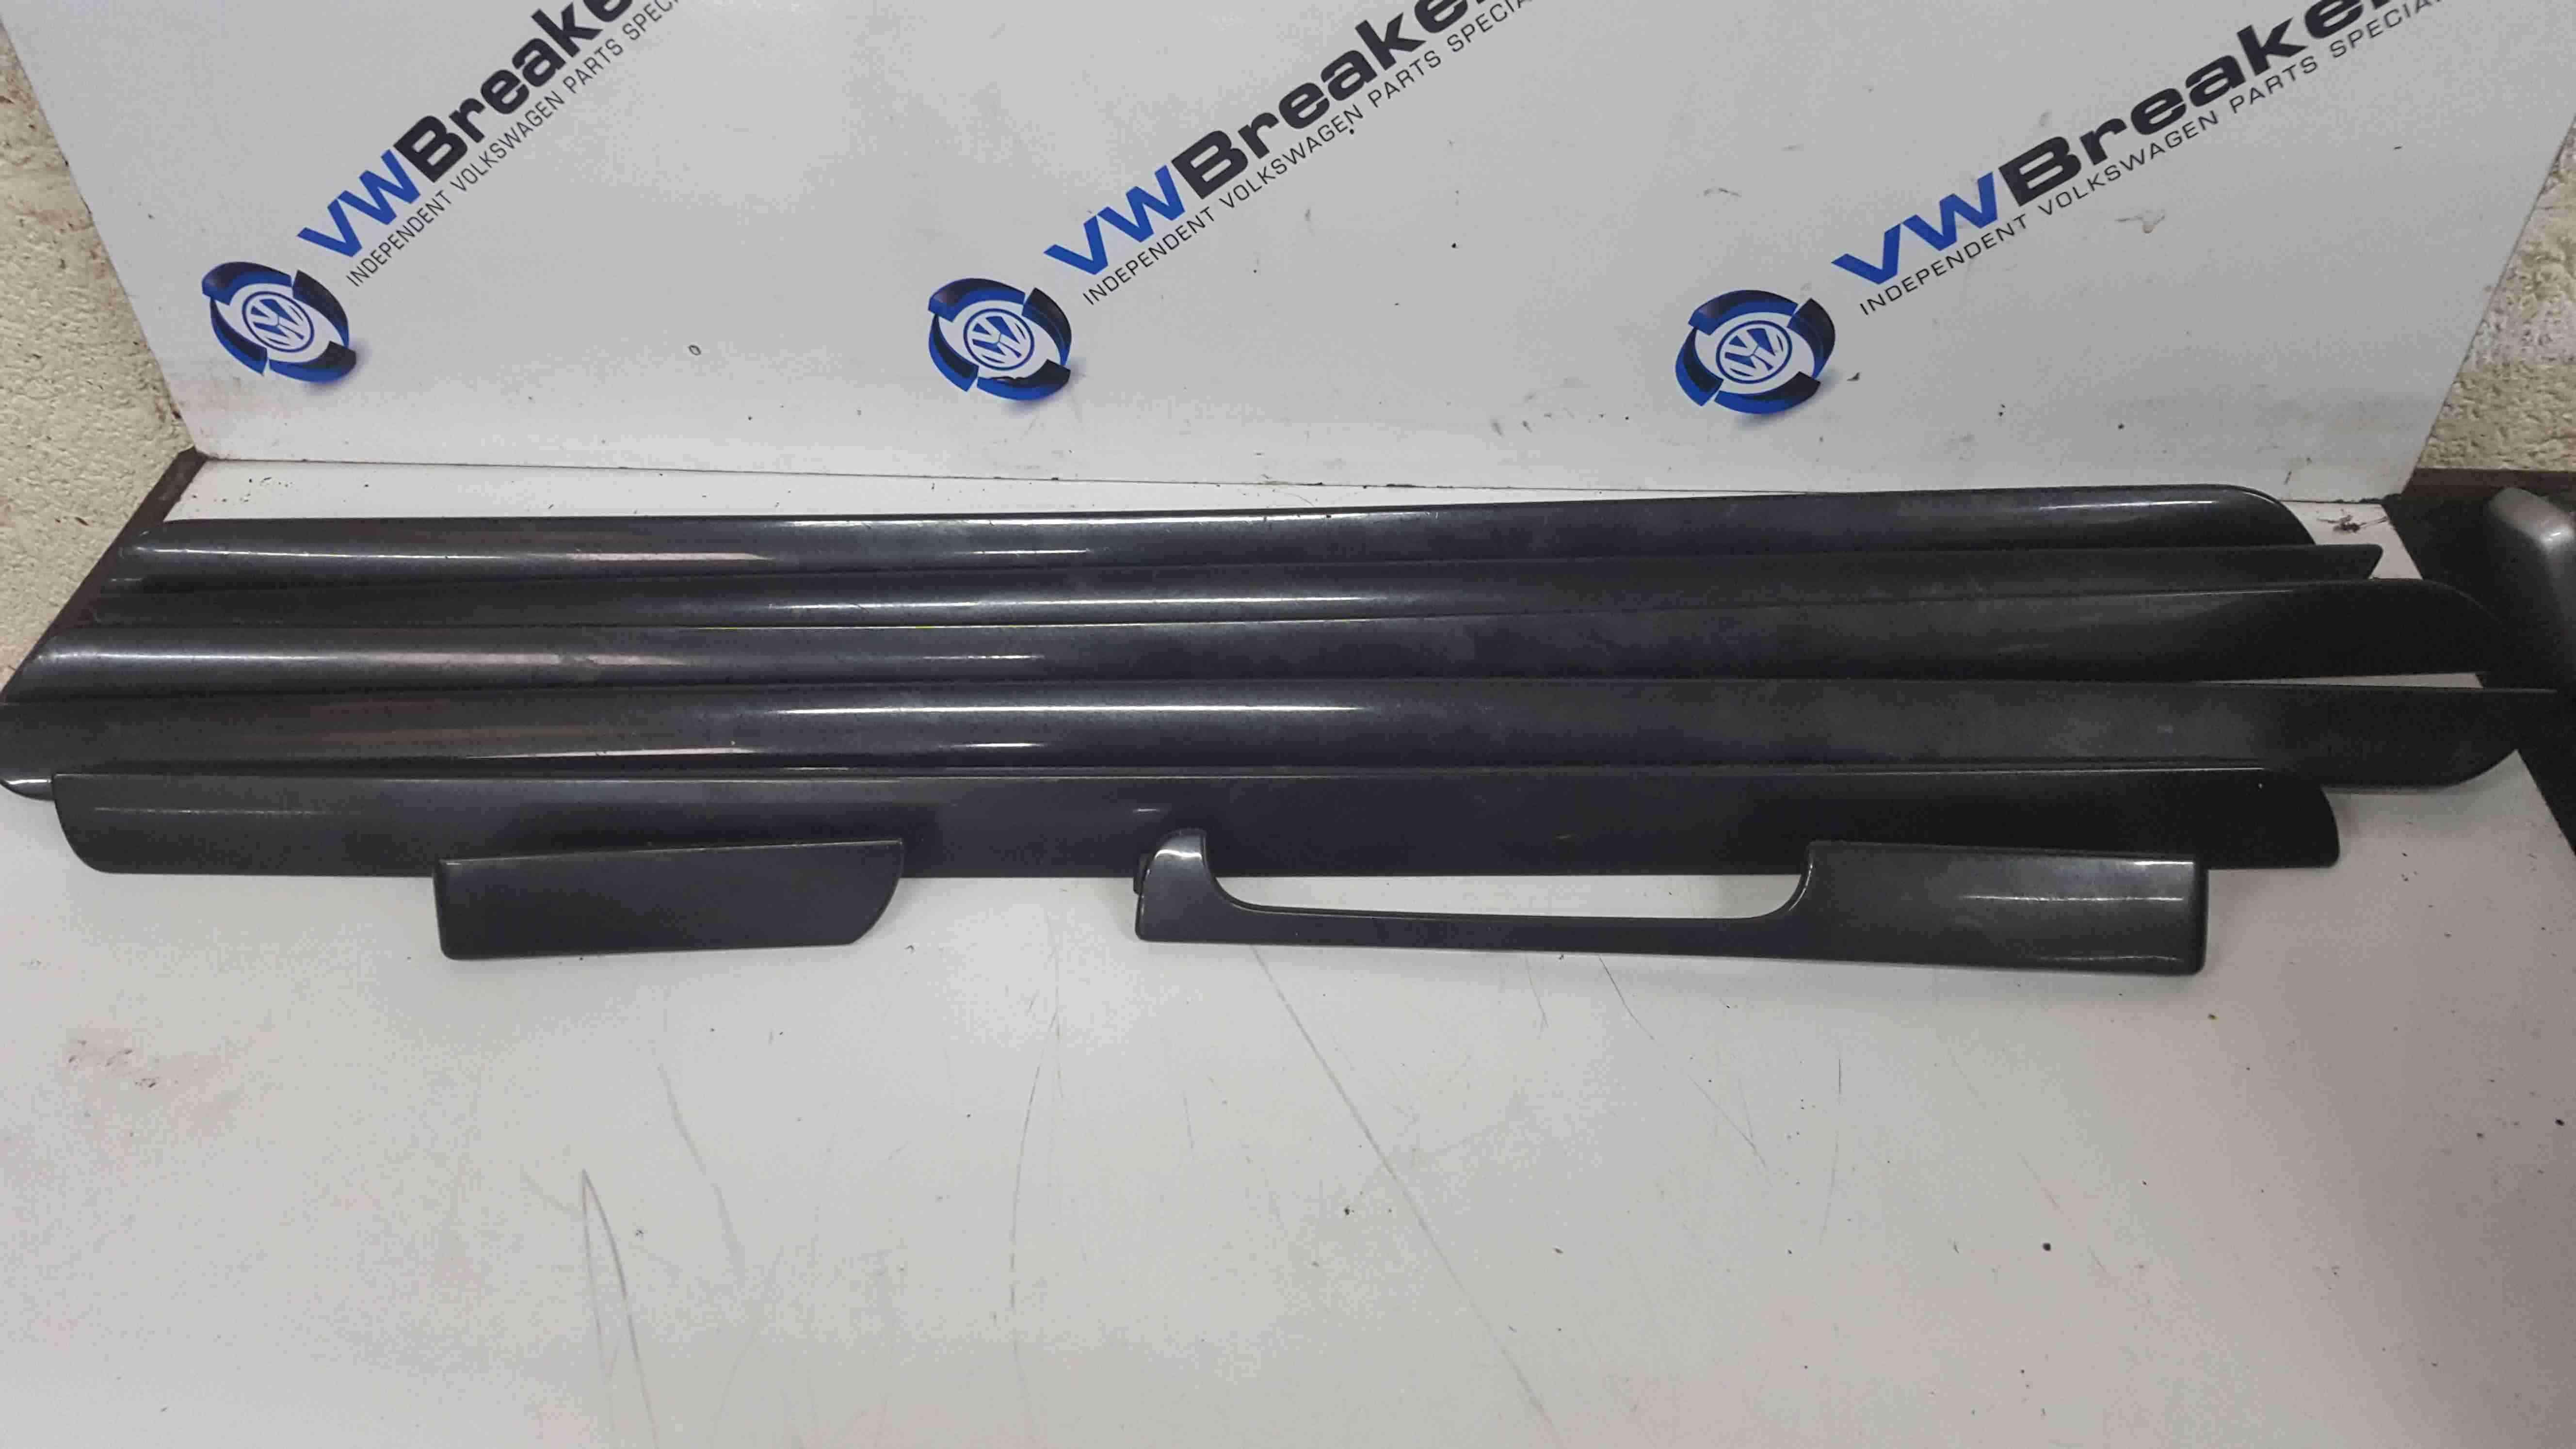 Volkswagen Golf GT MK5 2003-2009 Dashboard Inserts Trims Moulding 1K2858529